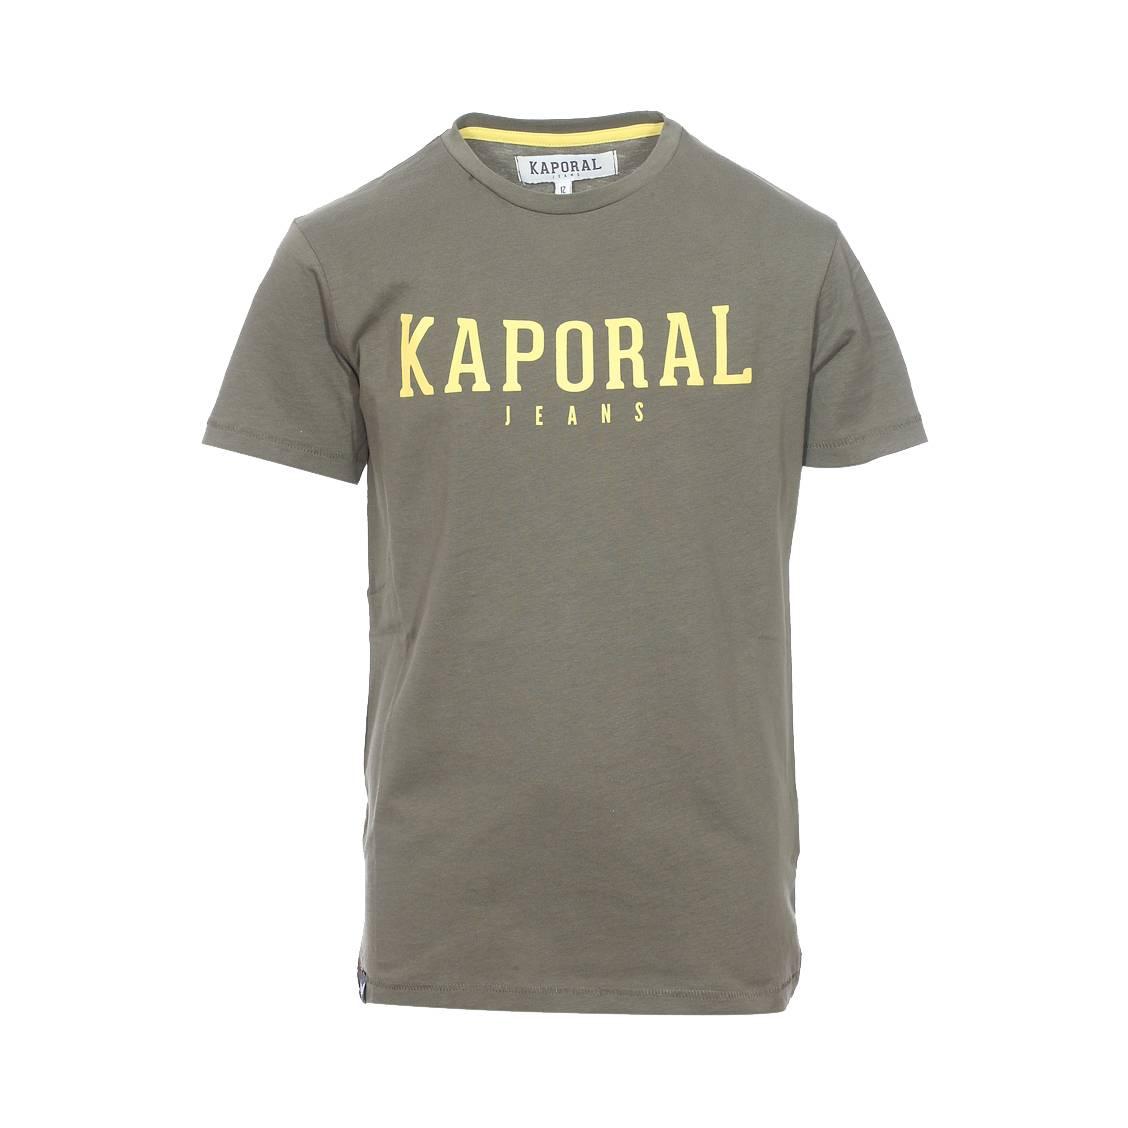 Tee-shirt col rond  rona en coton kaki floqué en jaune